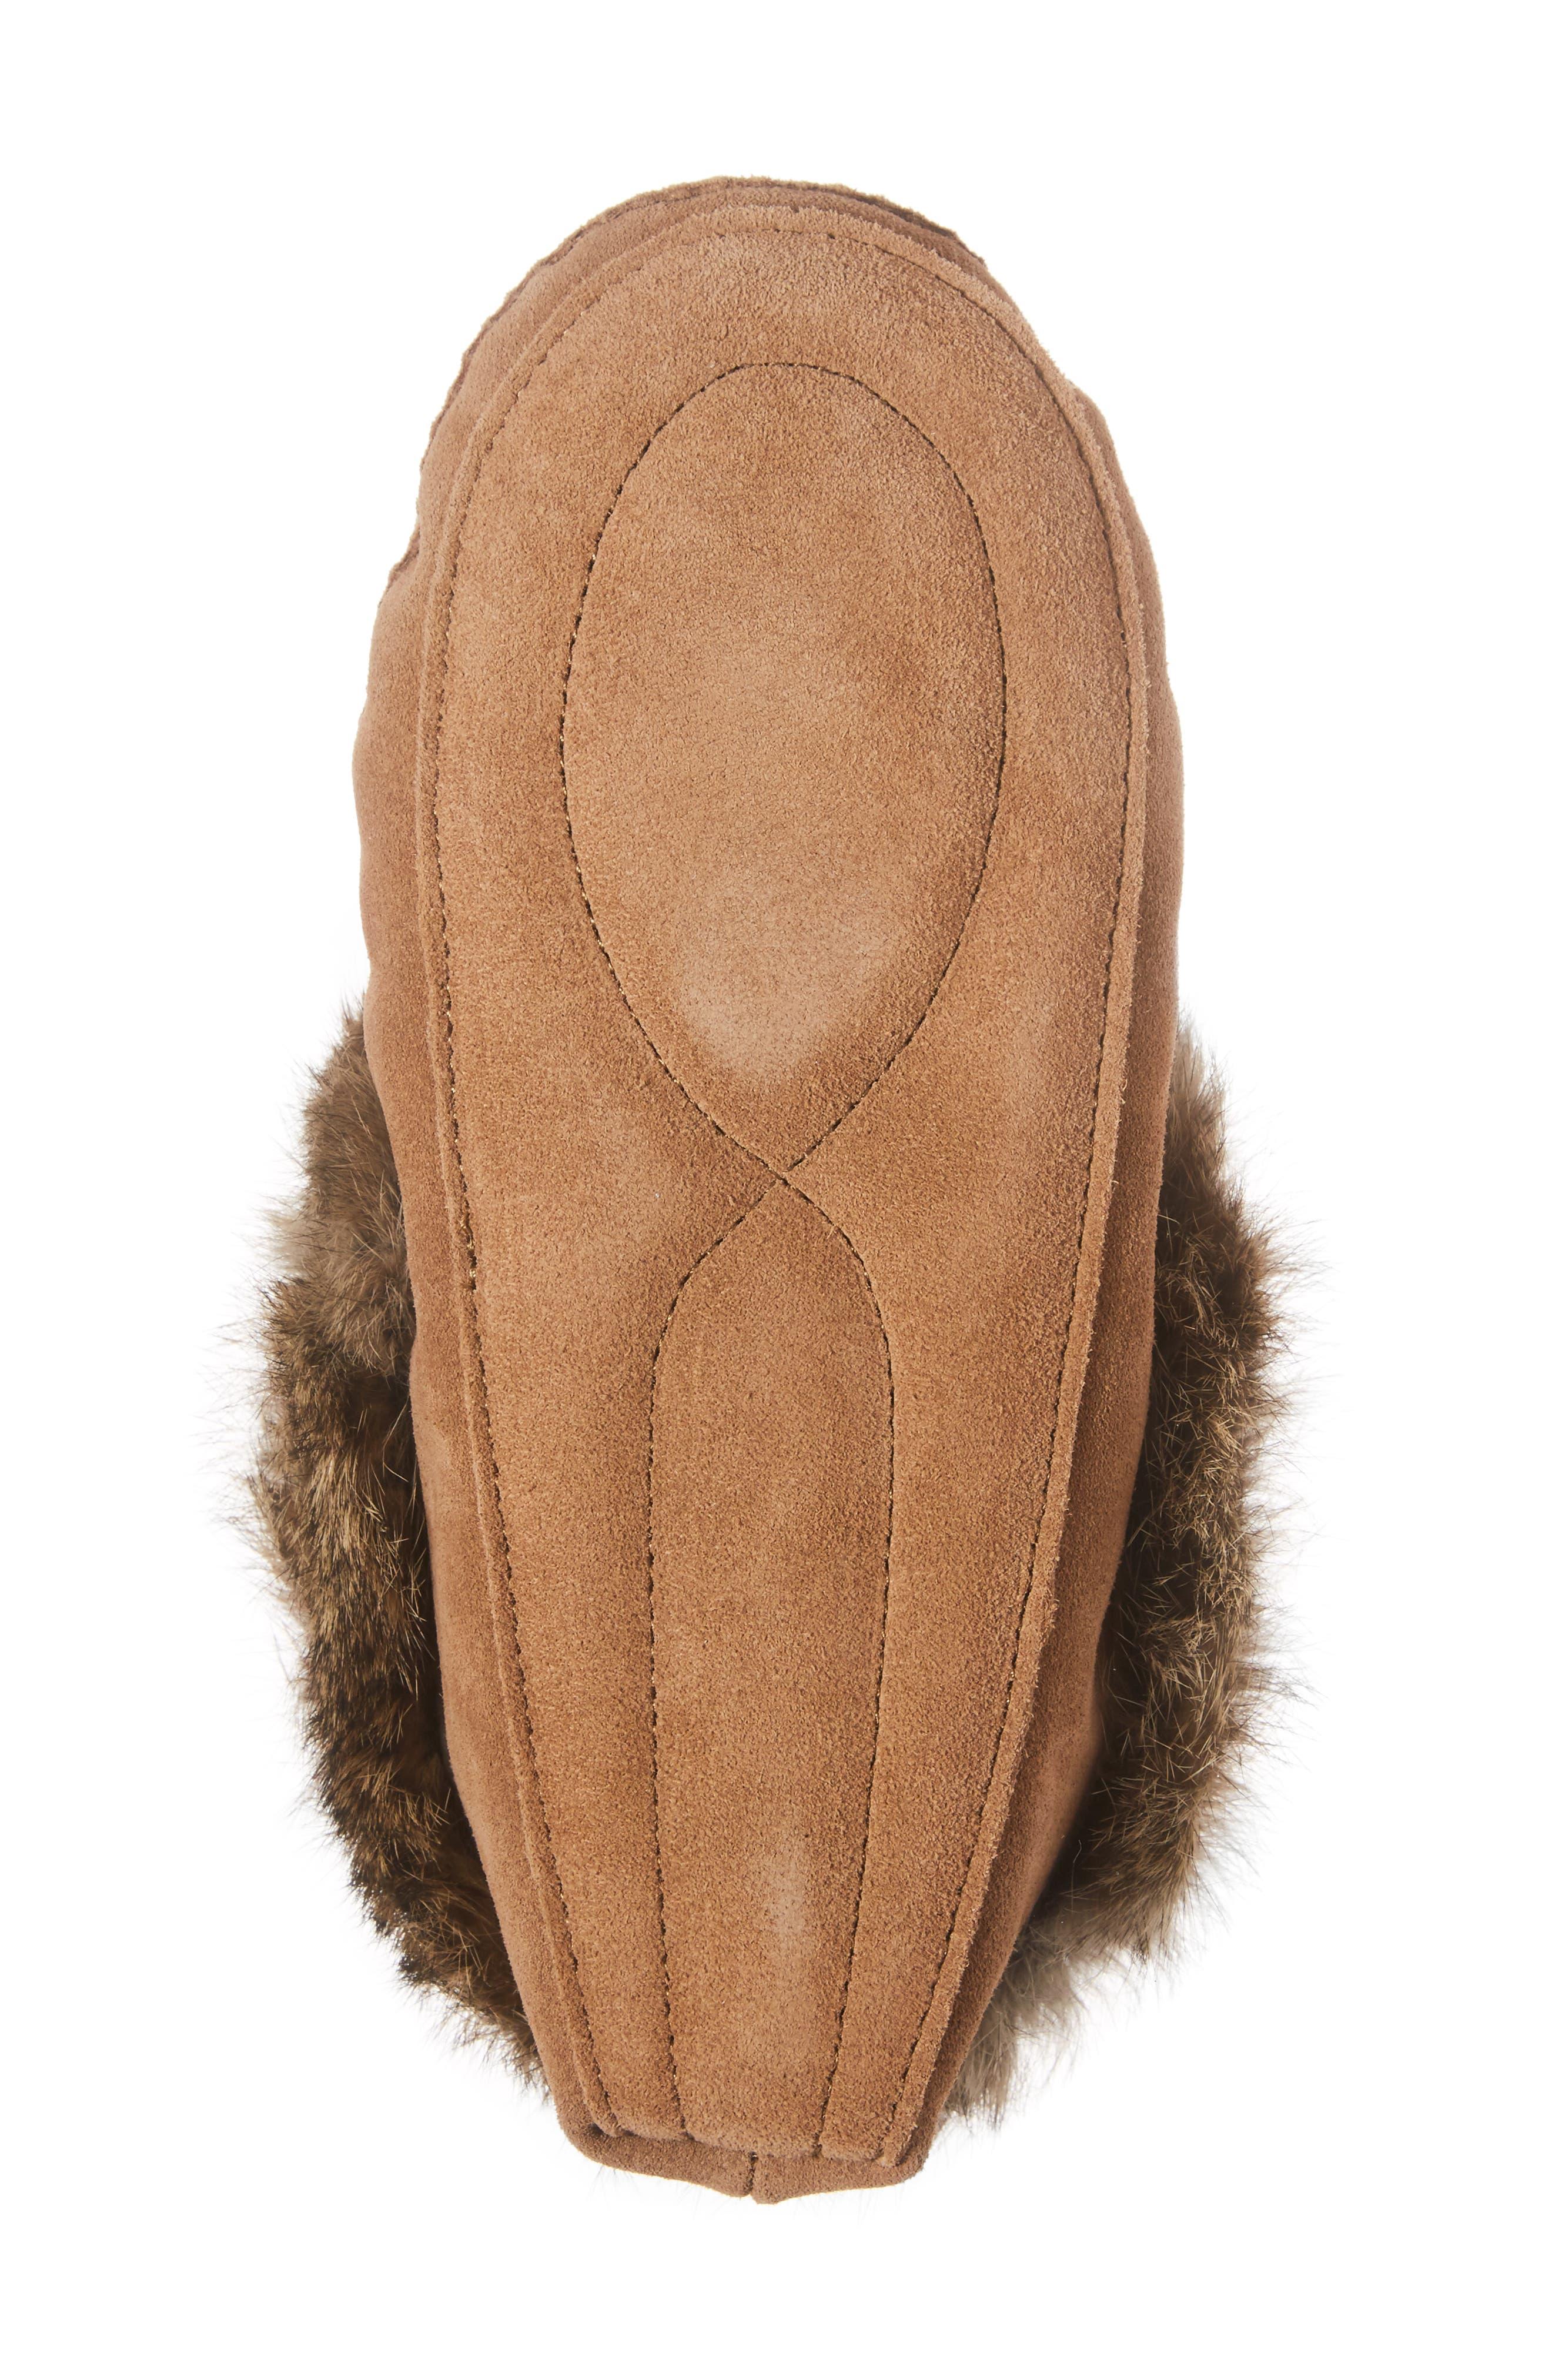 'Kanada' Genuine Rabbit Fur & Suede Moccasin Slipper,                             Alternate thumbnail 6, color,                             OAK FUR